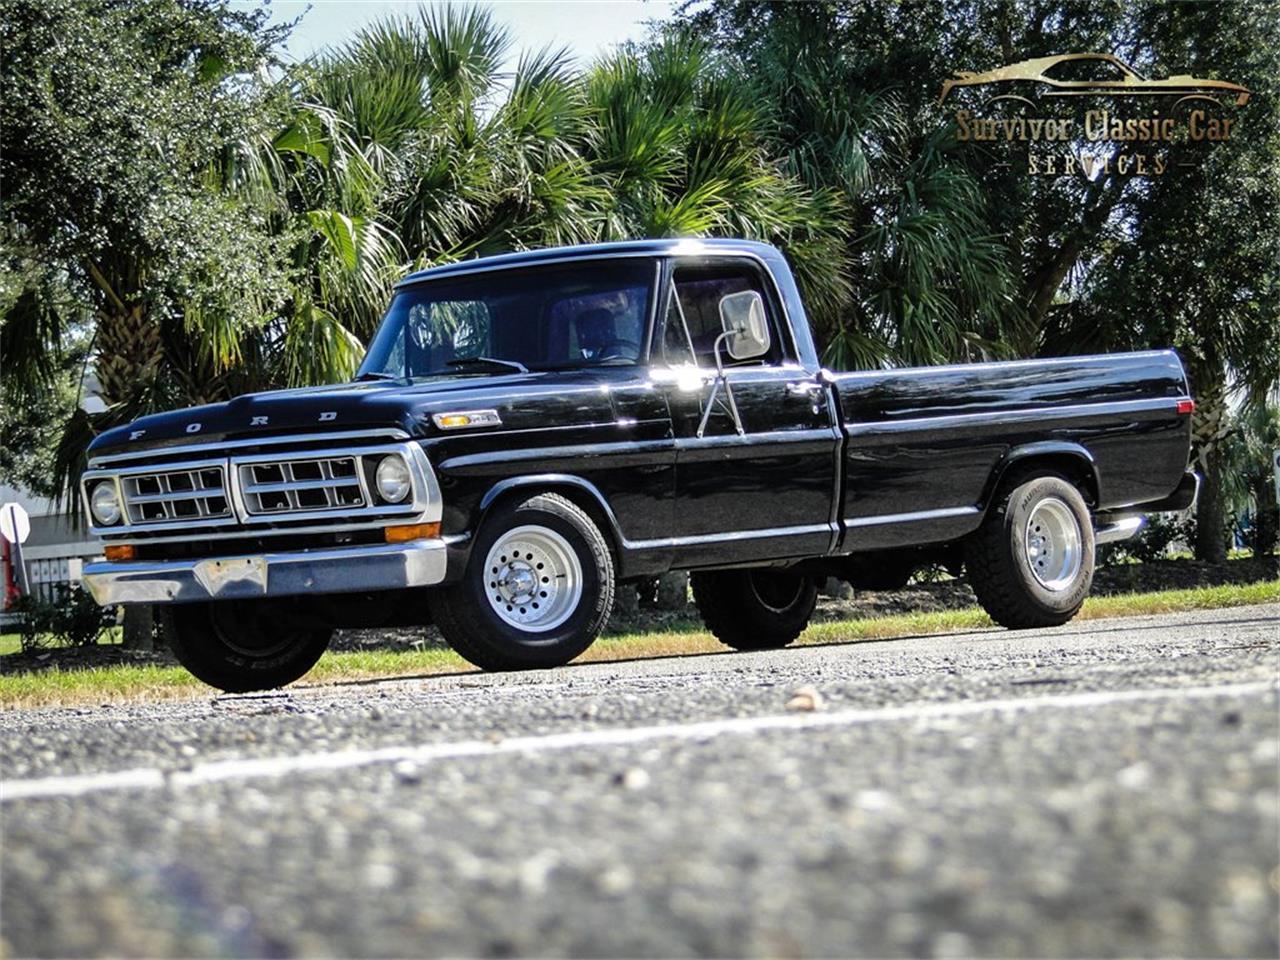 for sale 1971 ford f100 in palmetto, florida cars - palmetto, fl at geebo